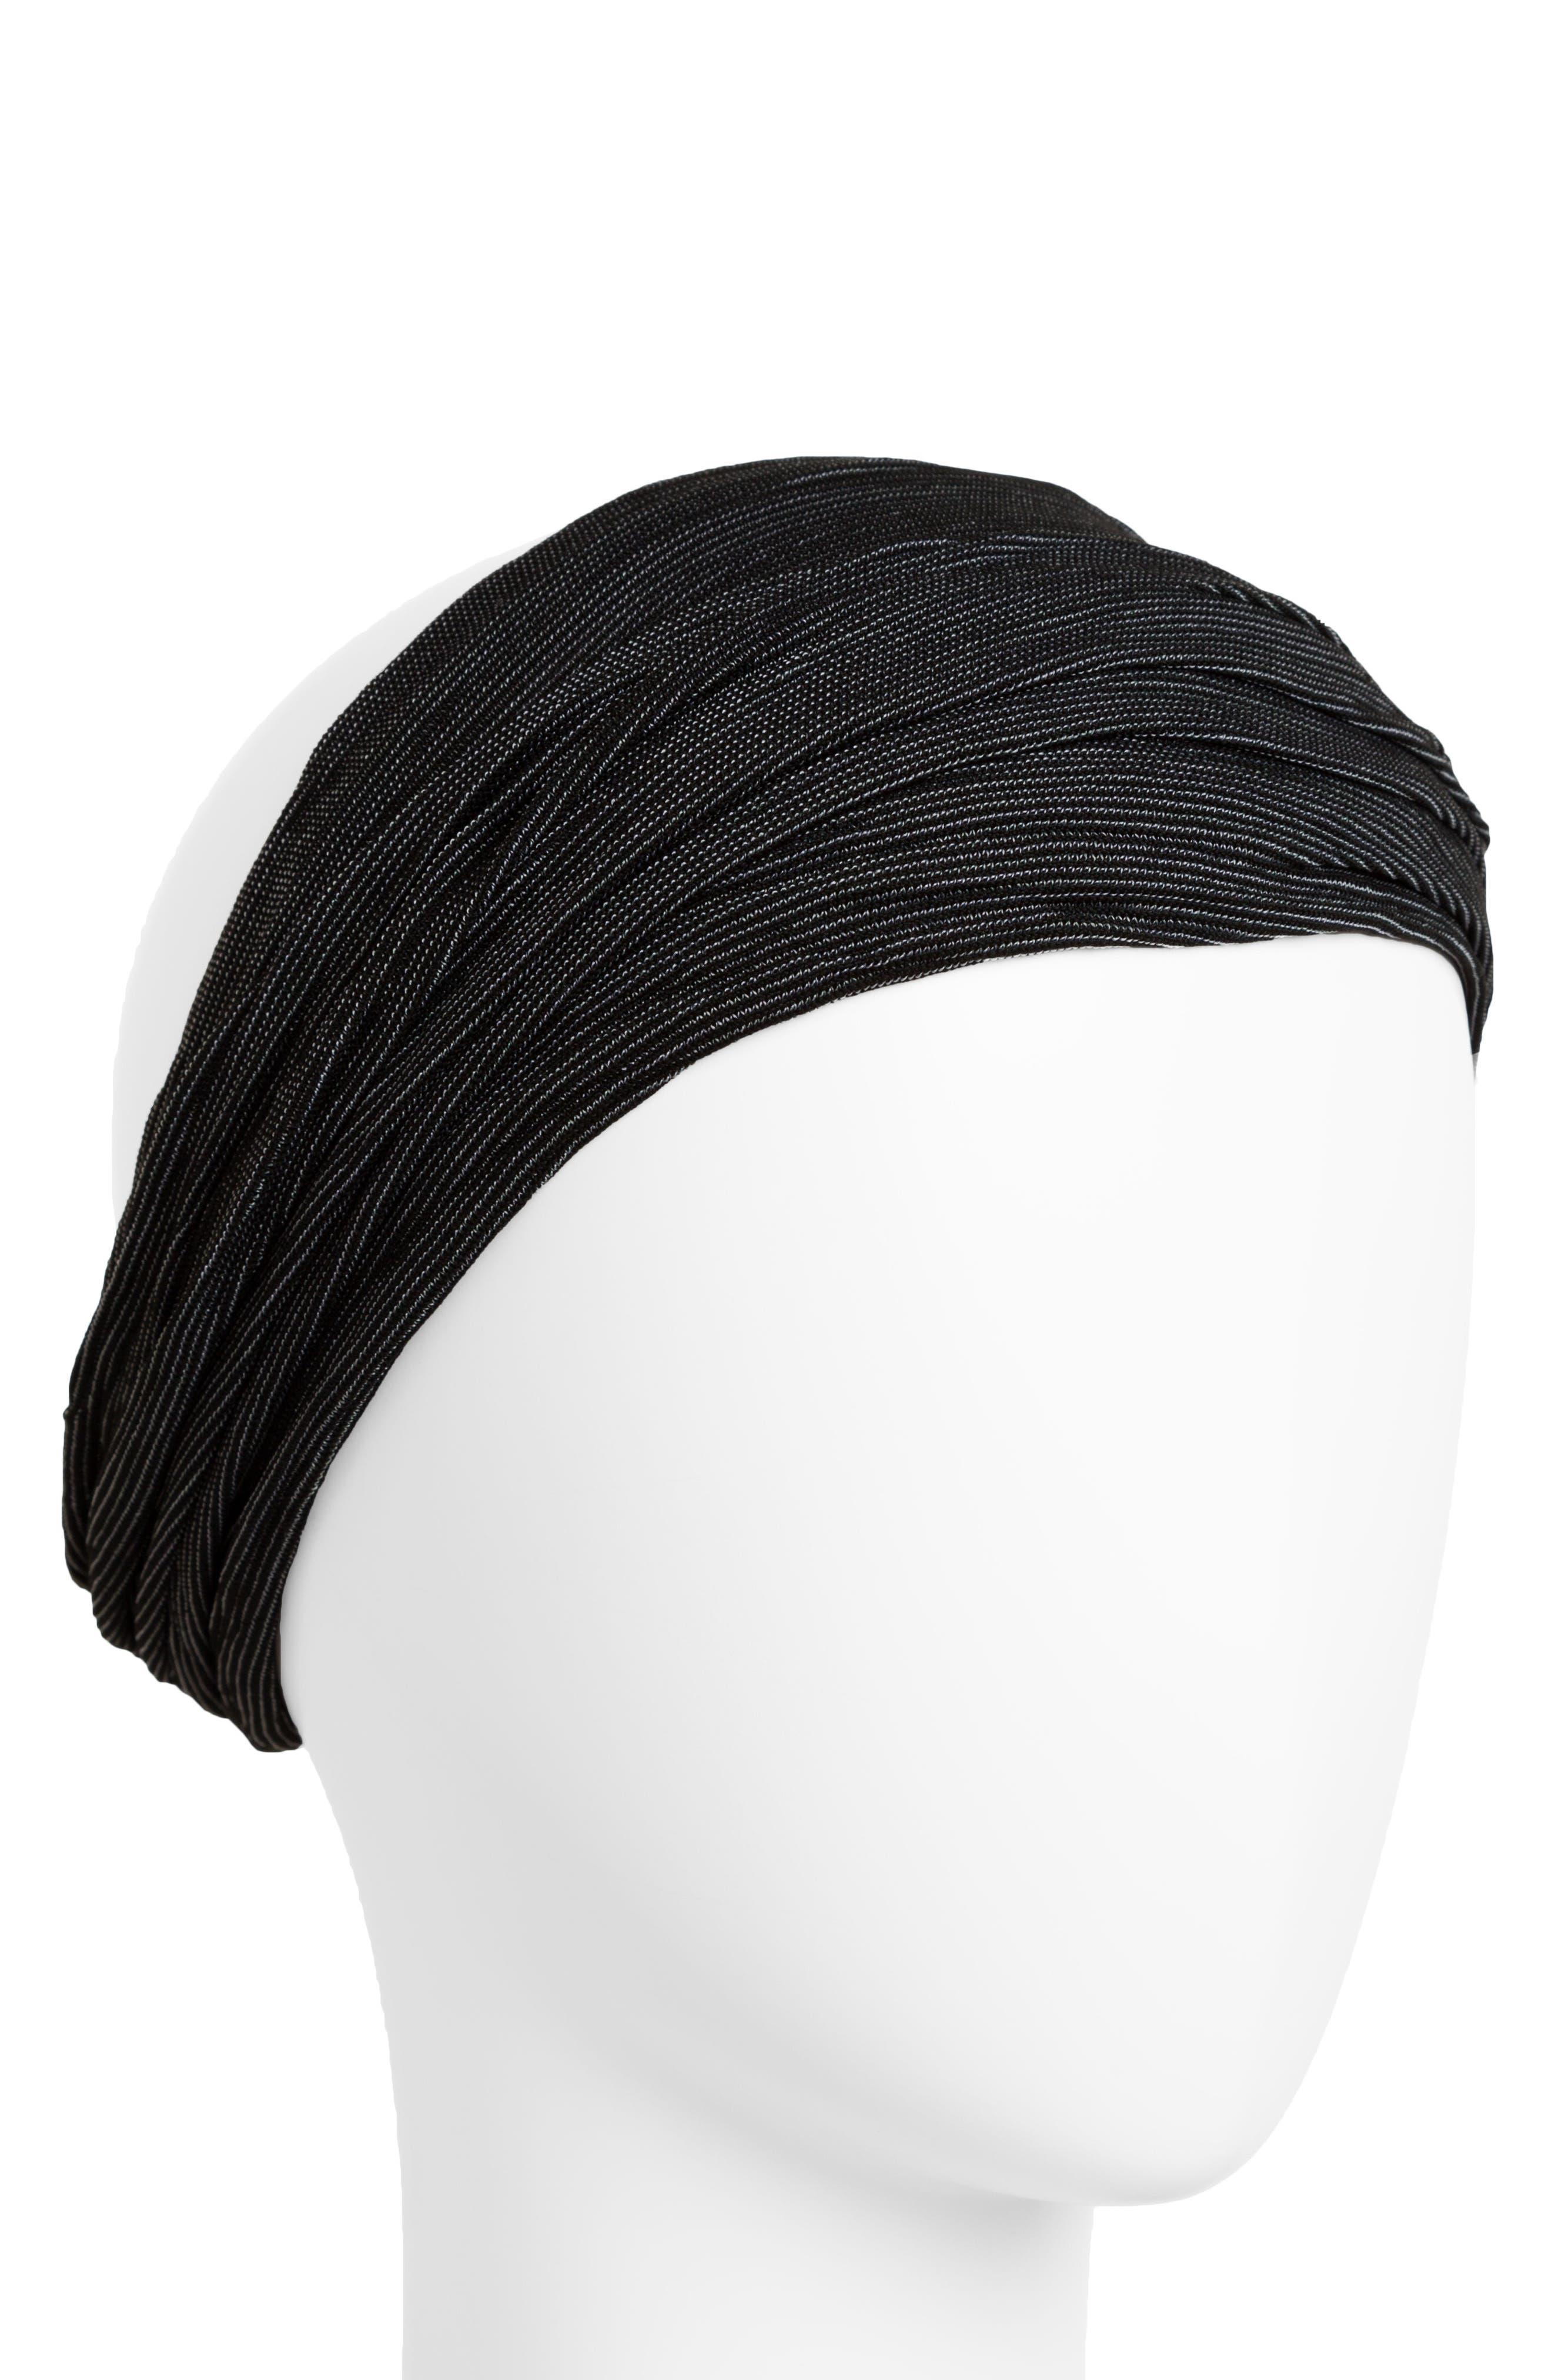 Space Dye Relaxed Turban Head Wrap,                             Main thumbnail 1, color,                             001